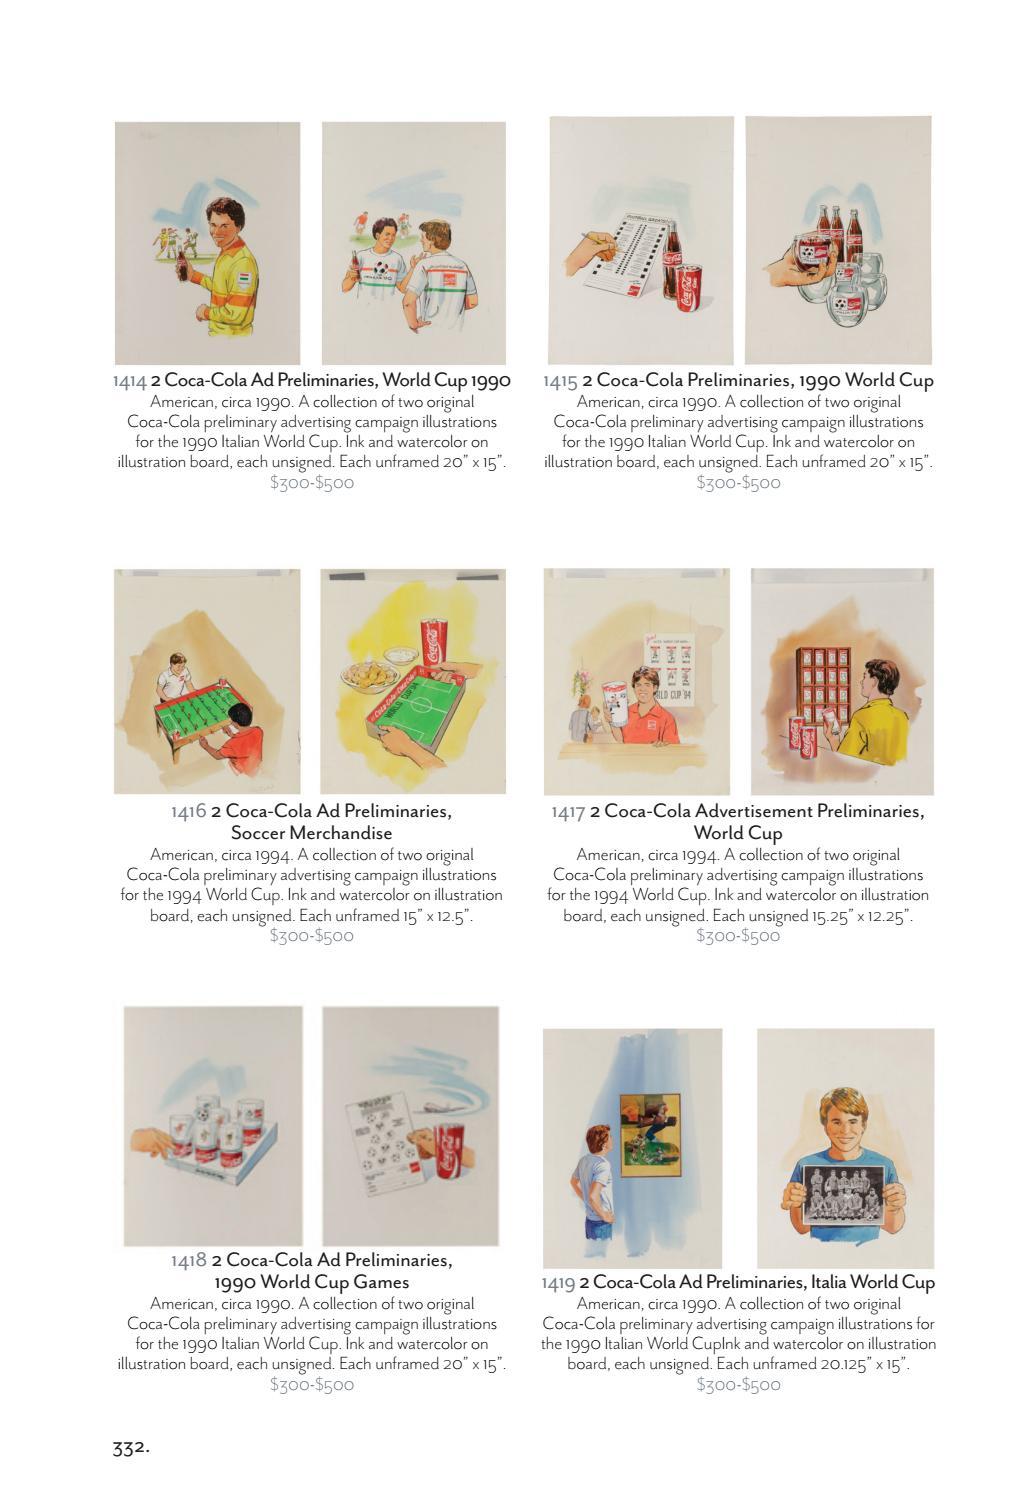 Ahlers & Ogletree January 2017 Auction Catalog | New Year's